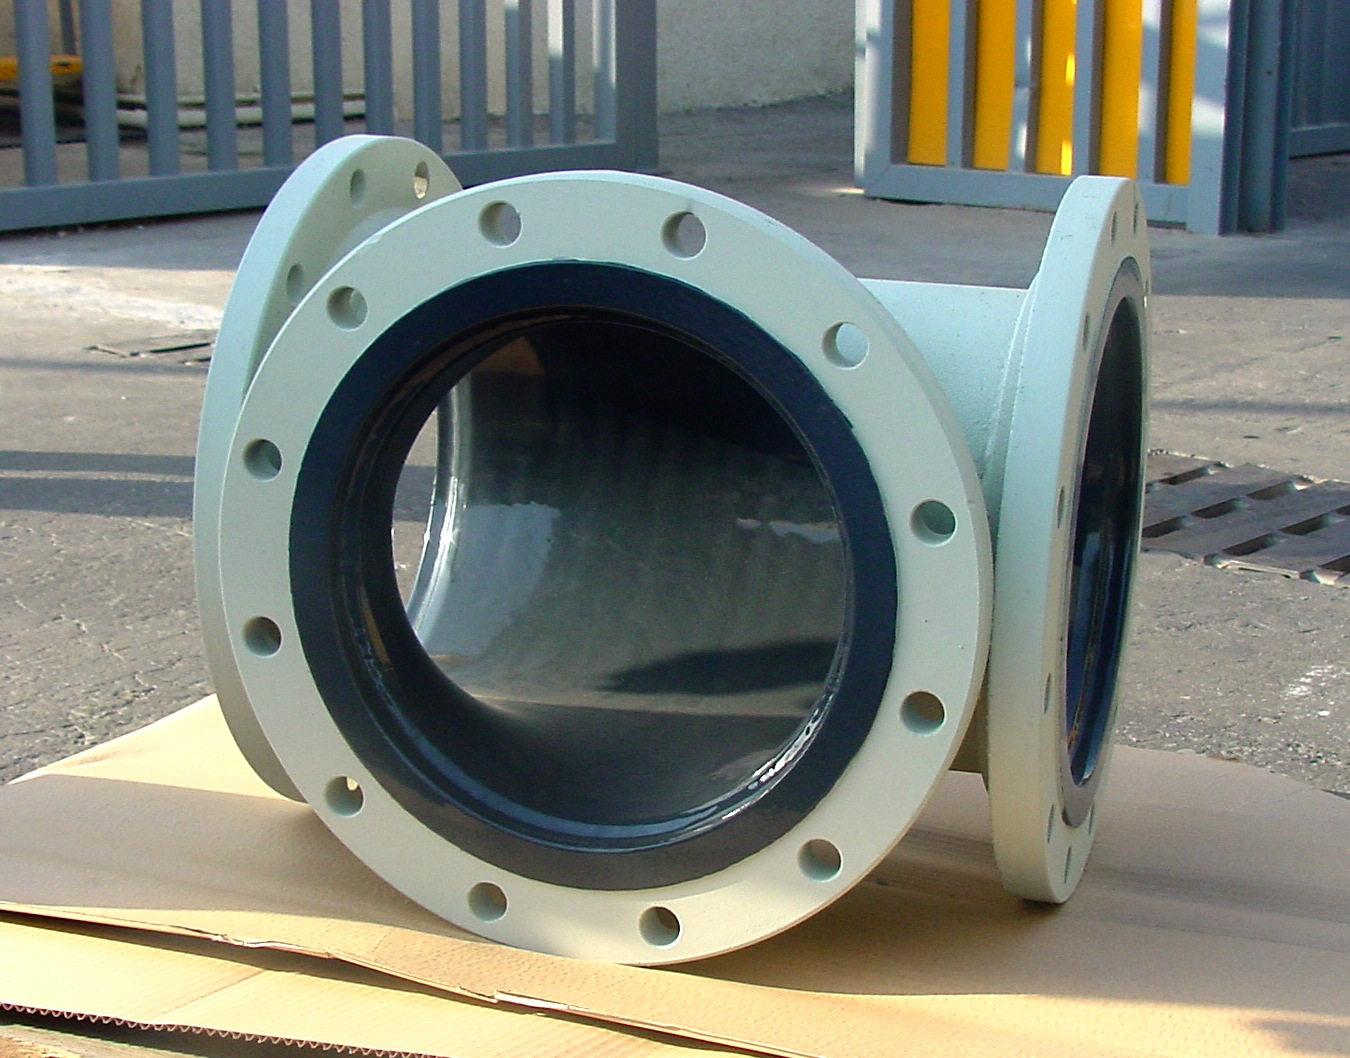 ppa-industrial-coating